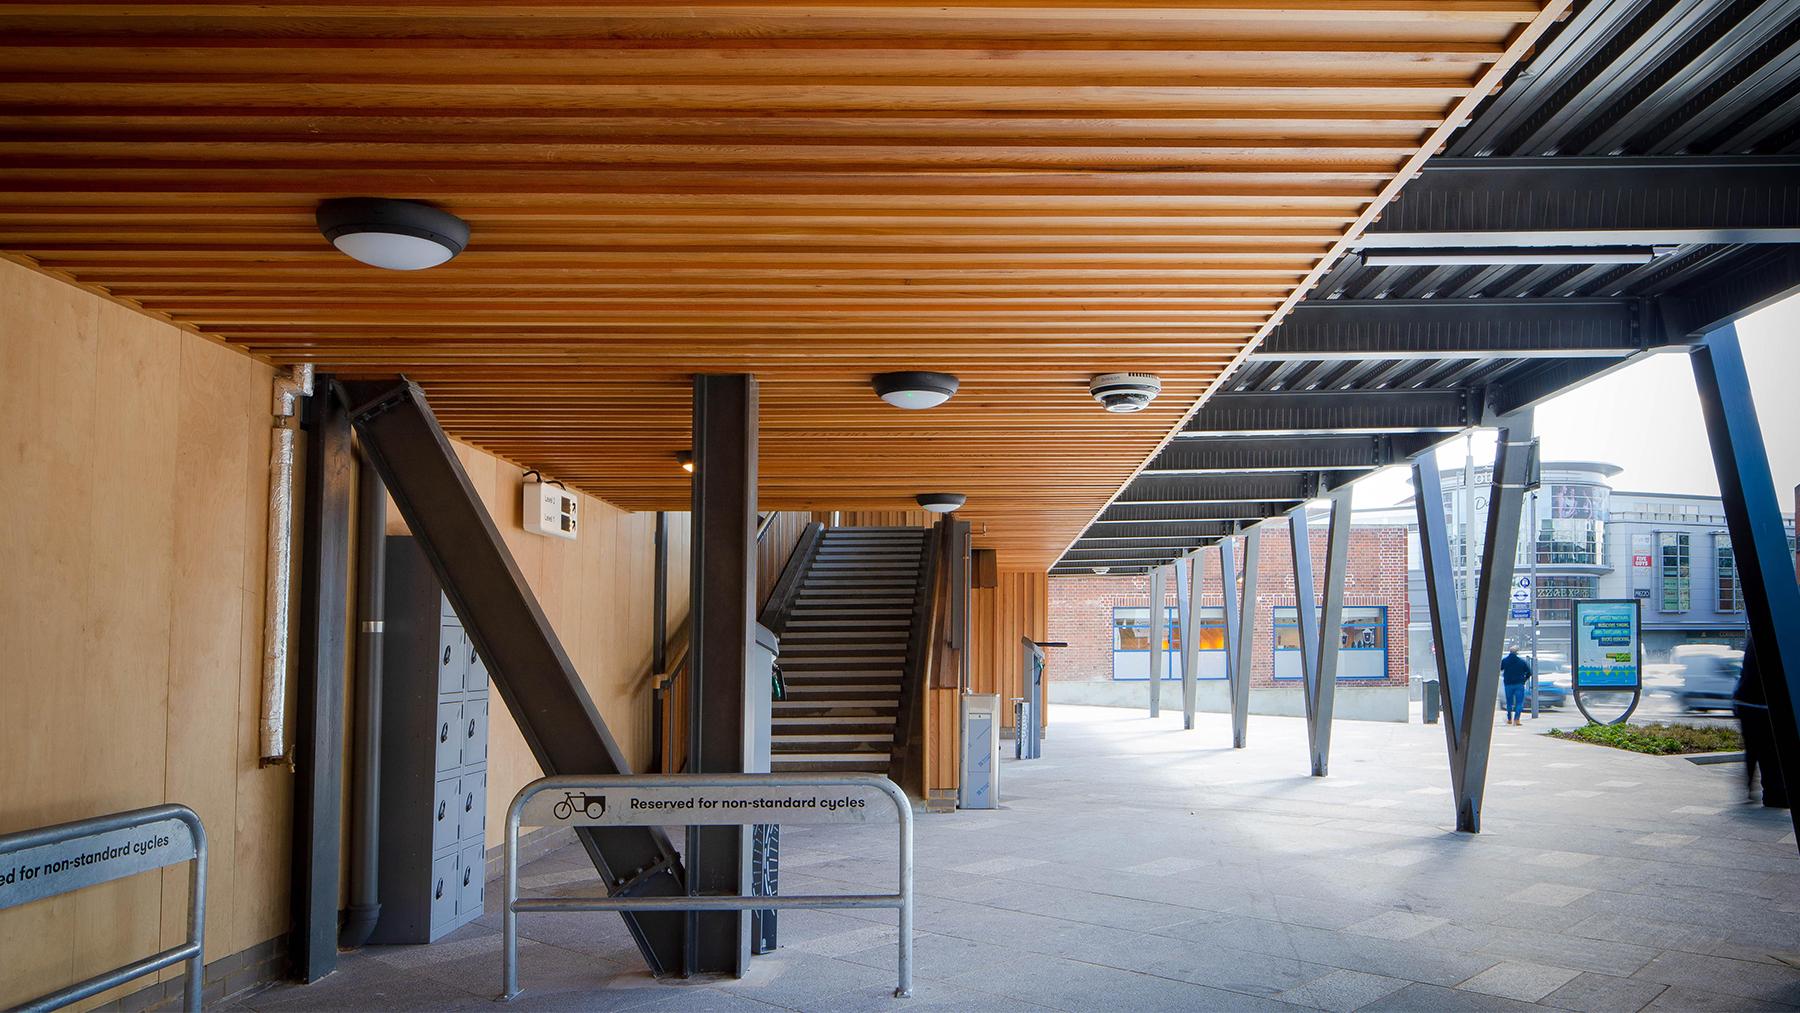 Sarah-Wigglesworth-Architects Kingston-Go-Cycle Hub Ground Floor  1800x1013